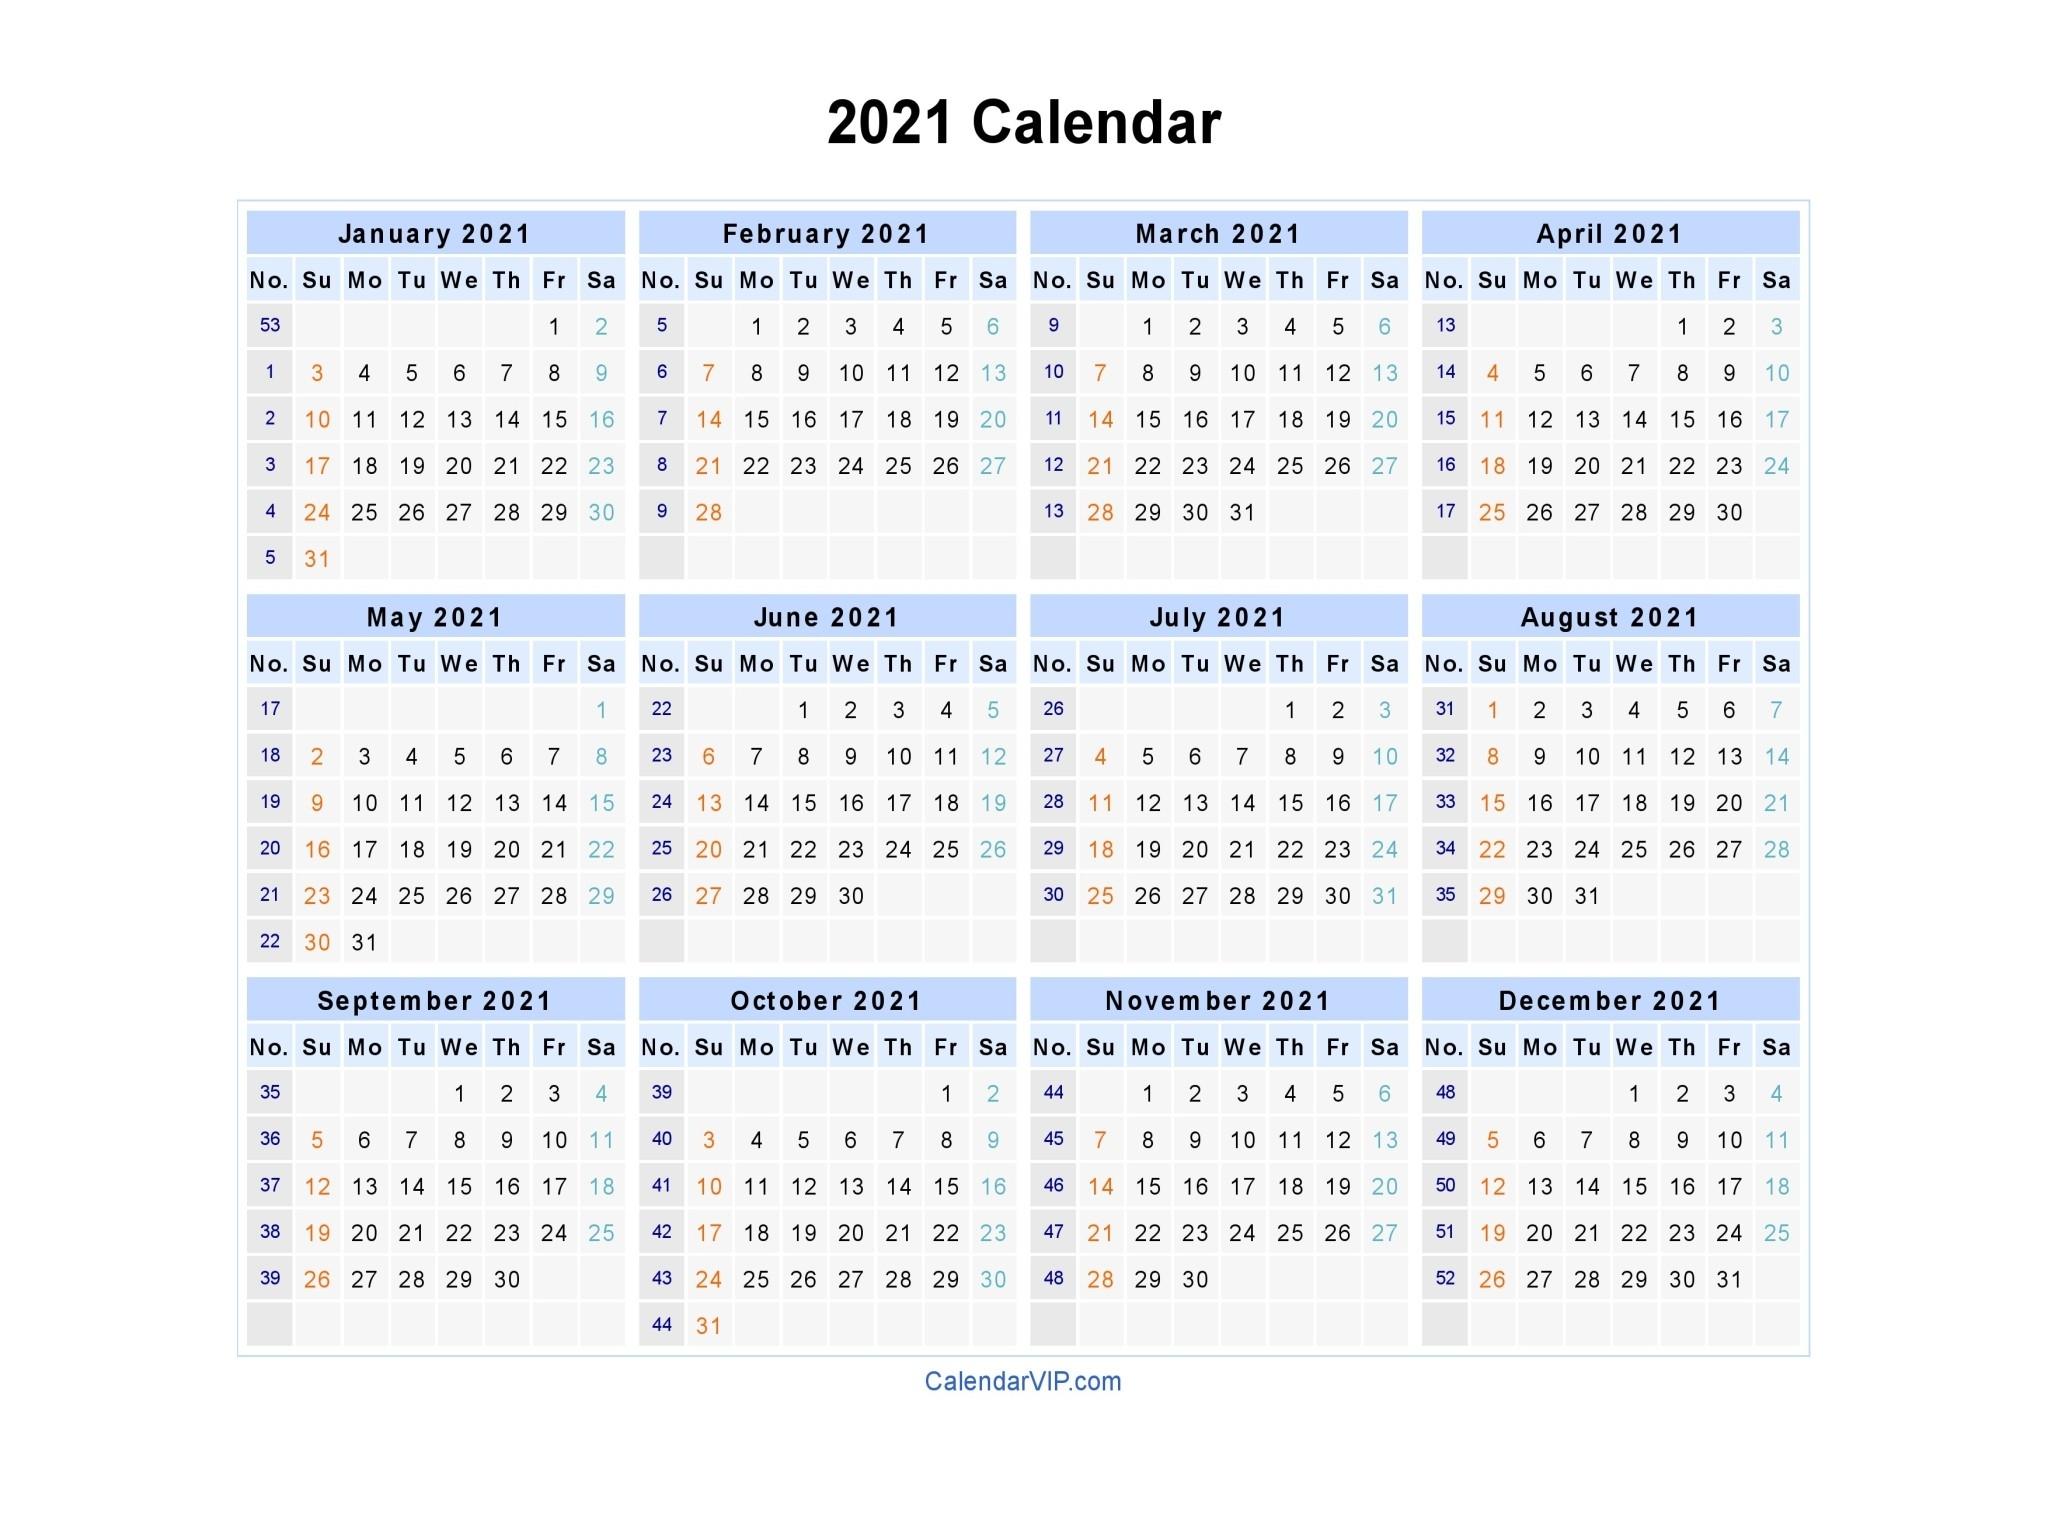 2021 Calendar - Blank Printable Calendar Template In Pdf Word Excel-Calendar For Shift Work 2021